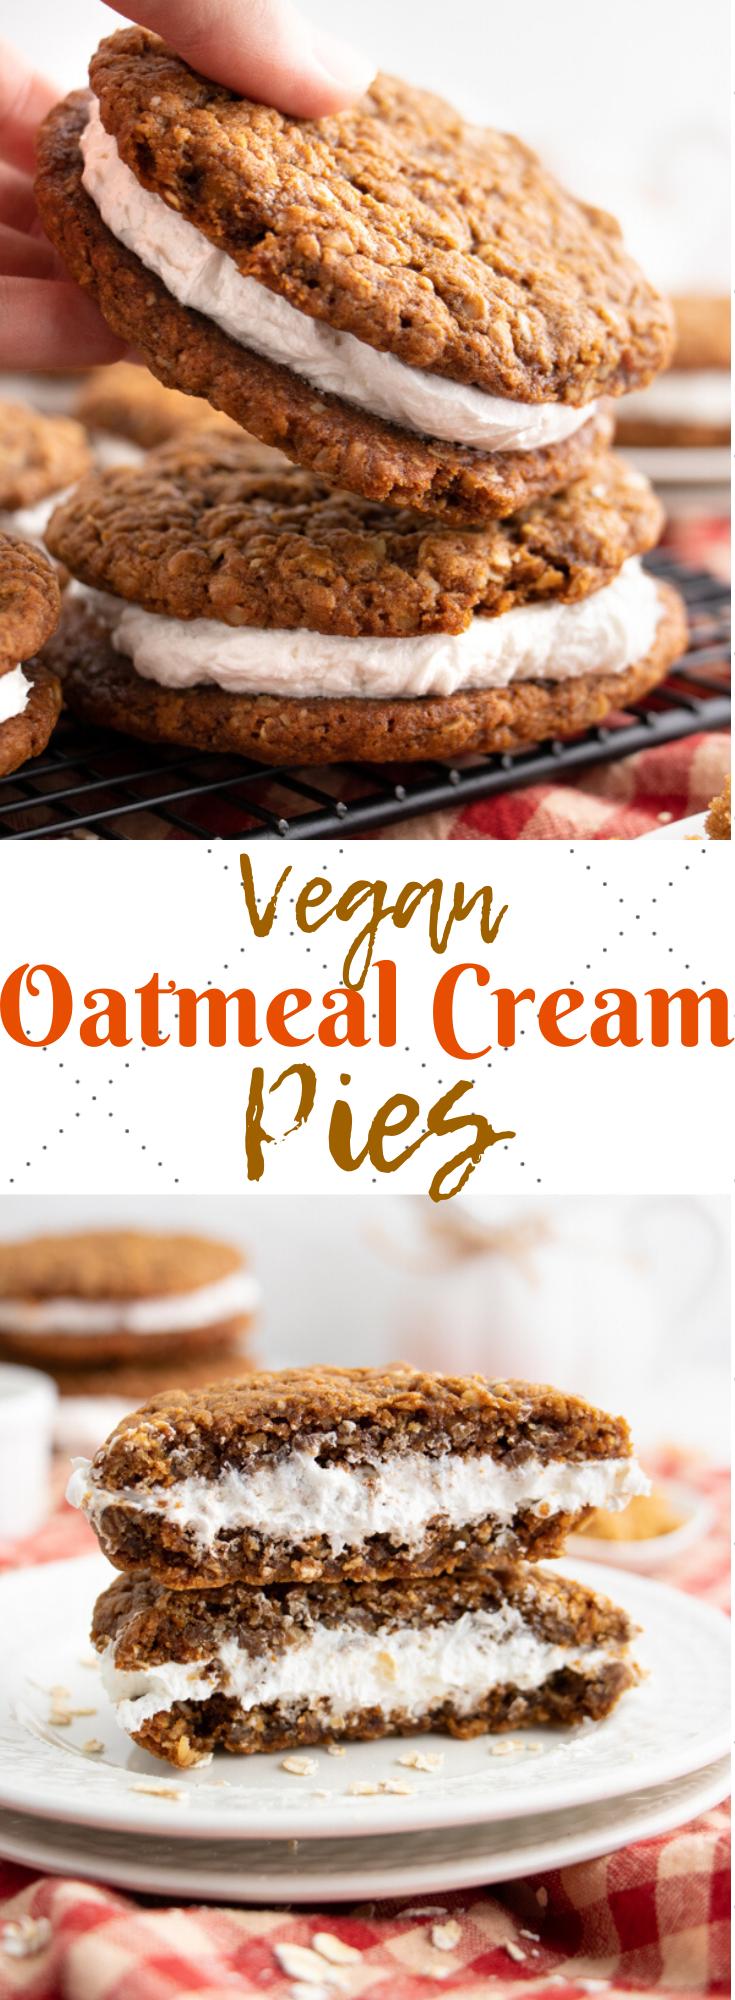 The Yummiest Vegan Oatmeal Cream Pies #sweetpie